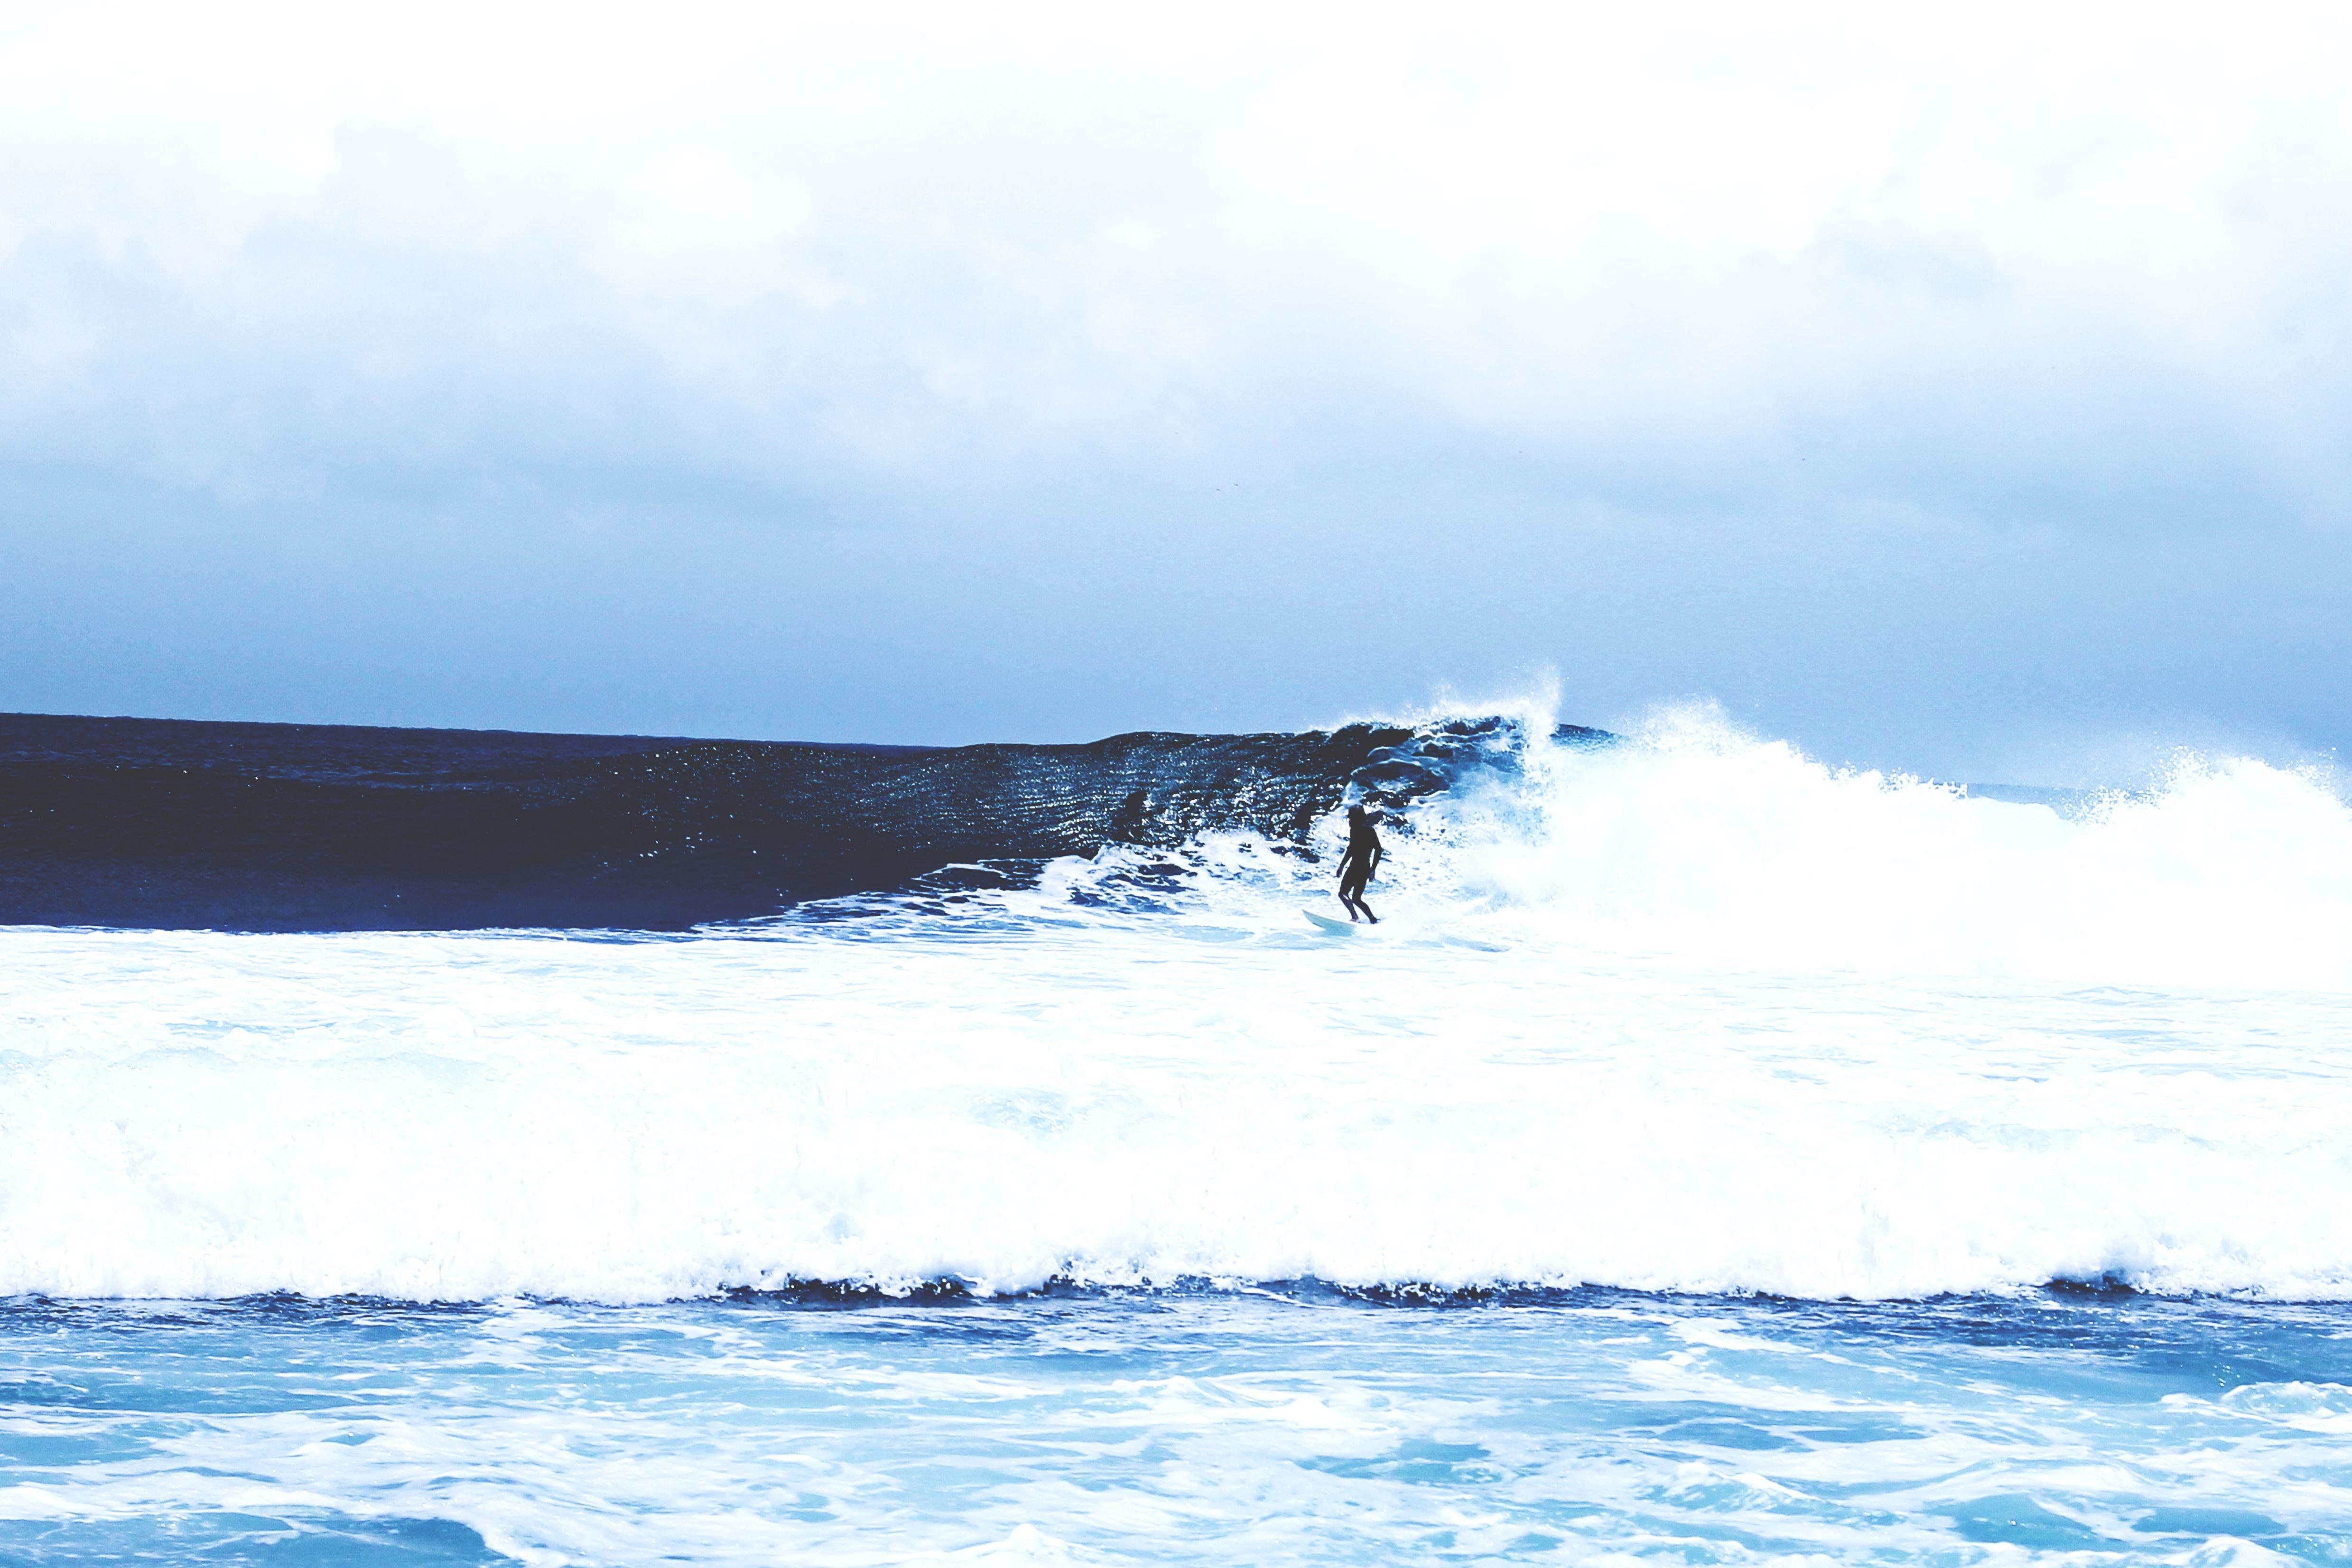 Sky, Wave, Splash, Summer, Surfing, Swim, Water, Ocean, Wind